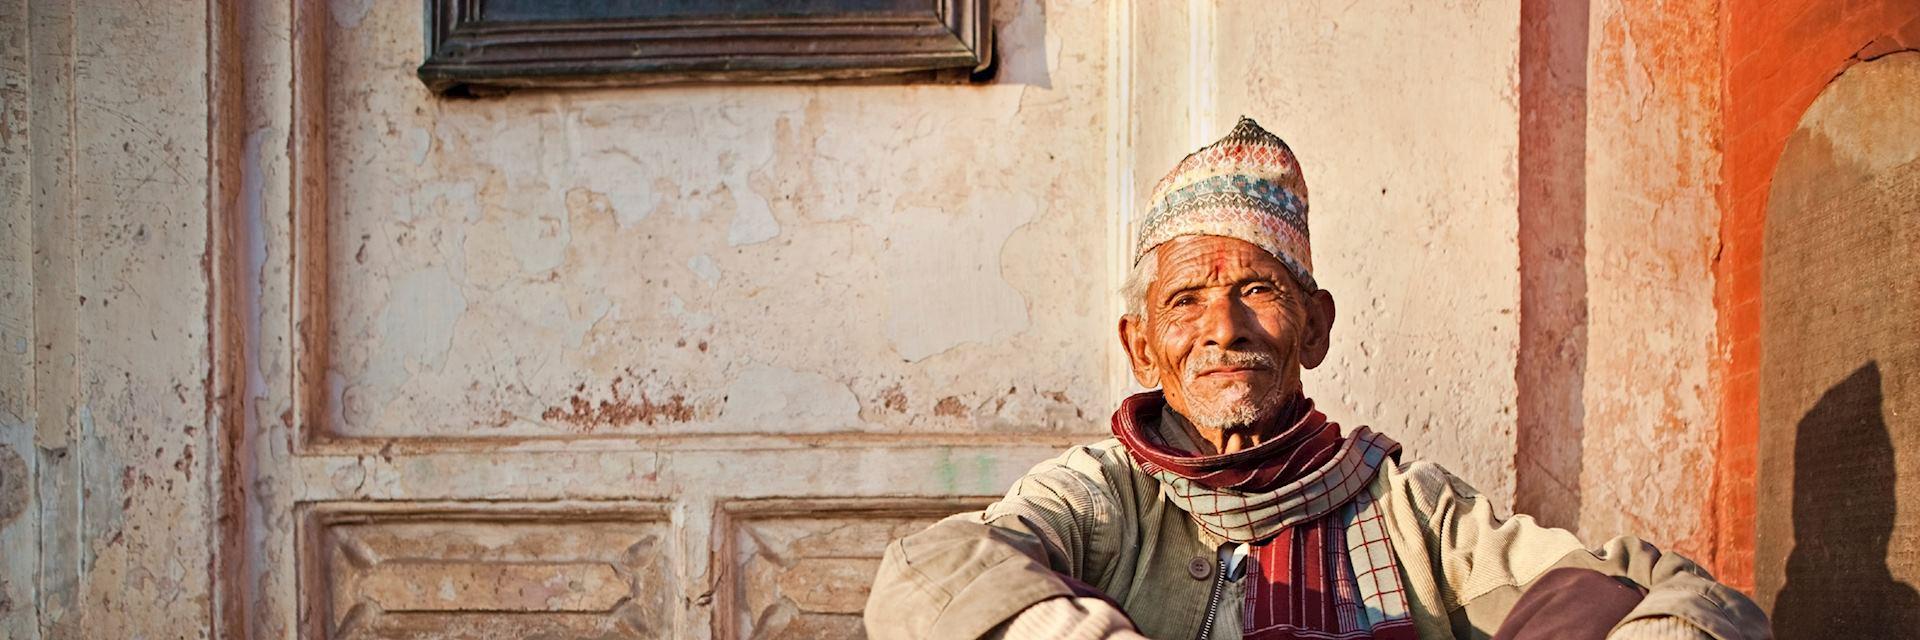 Nepalese man